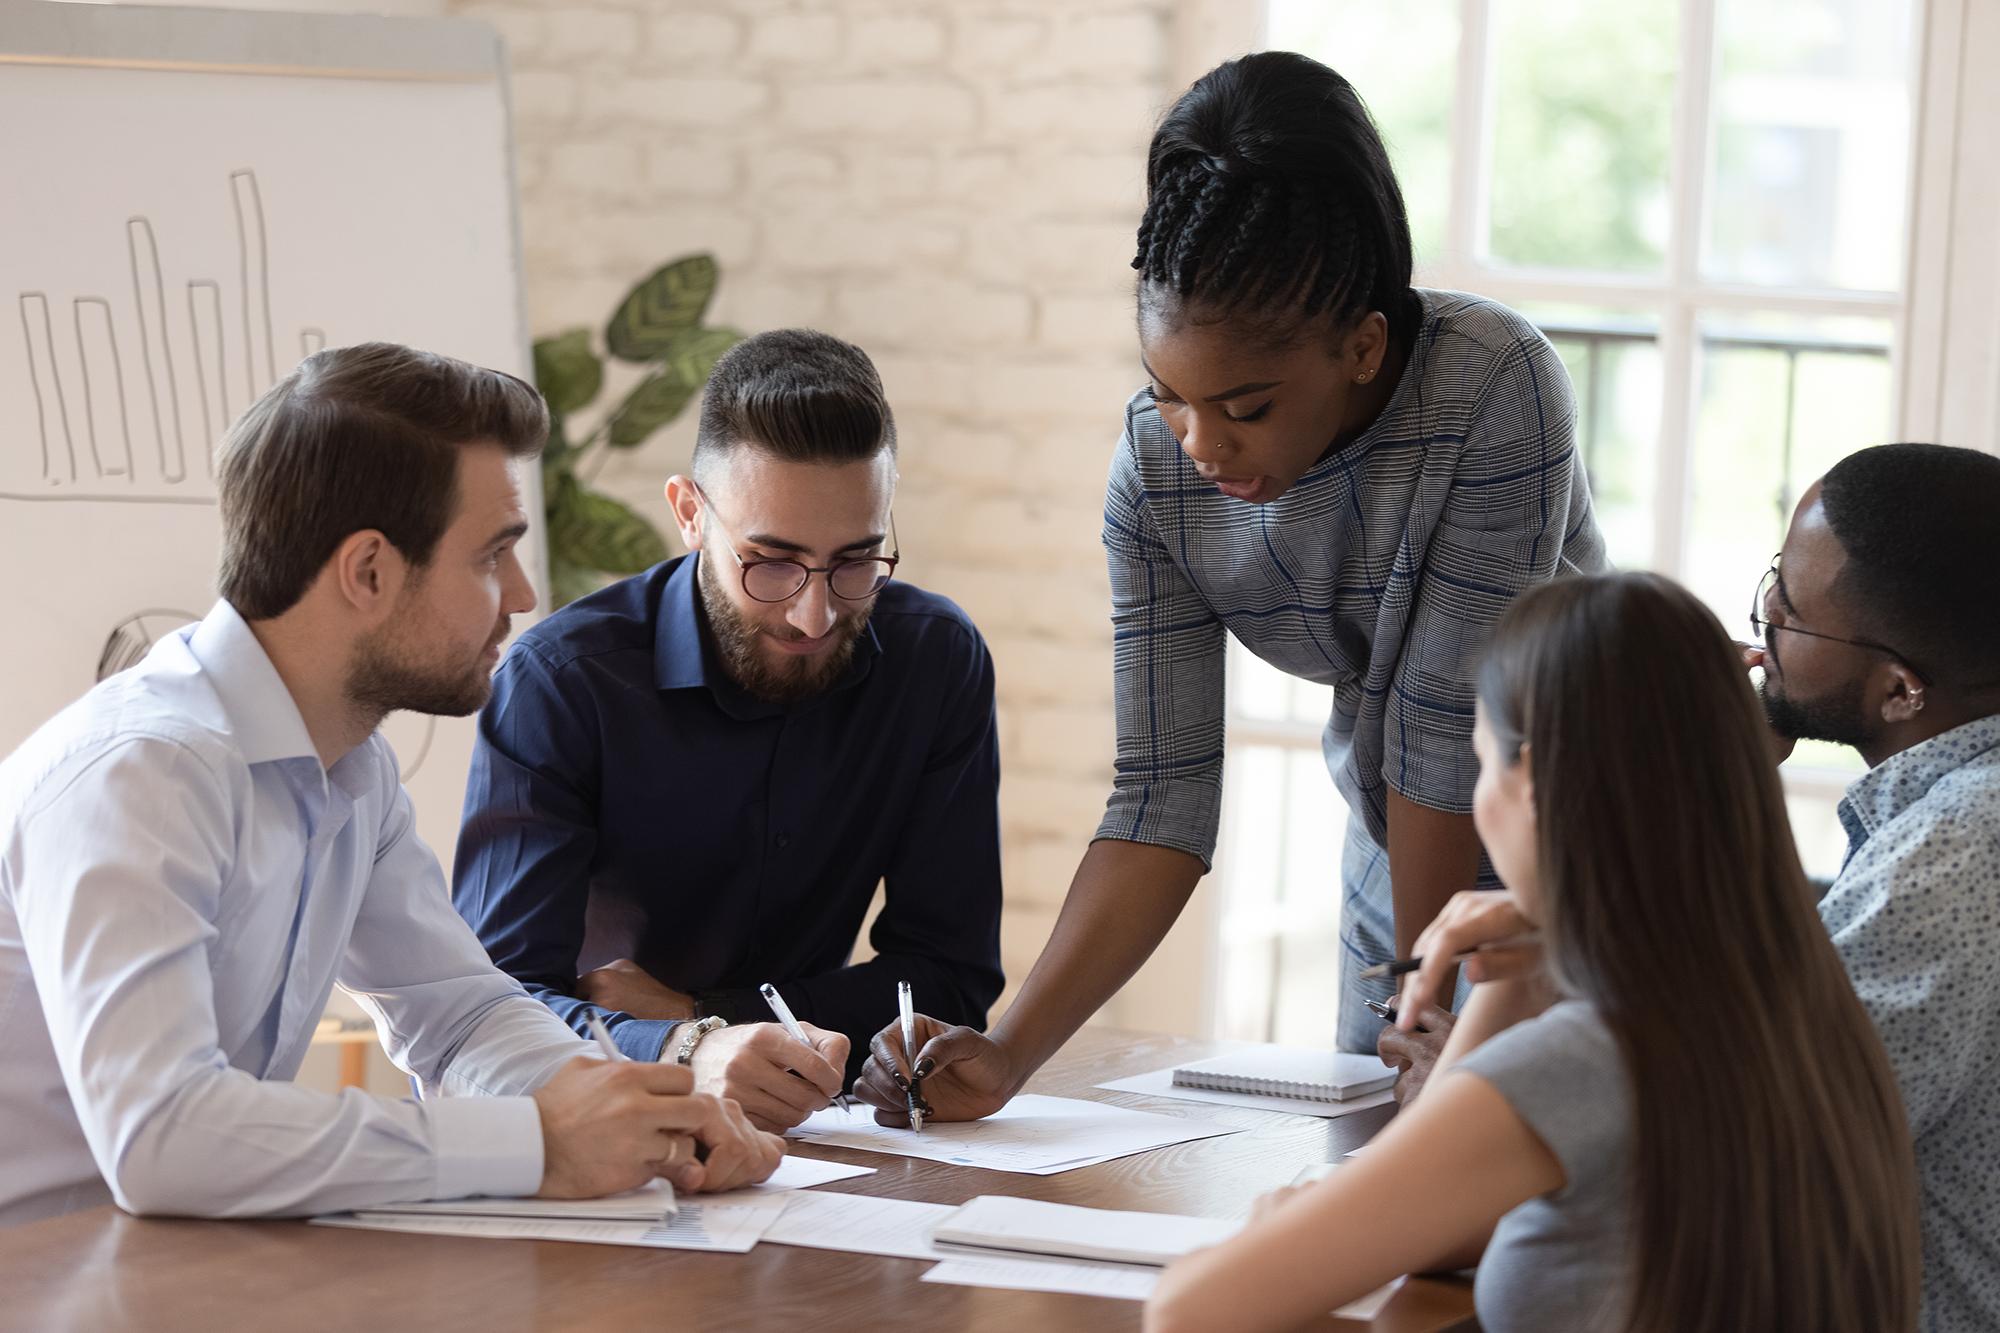 Woman supervisor boss teach diverse staff workers explain partnership agreement paperwork at group meeting